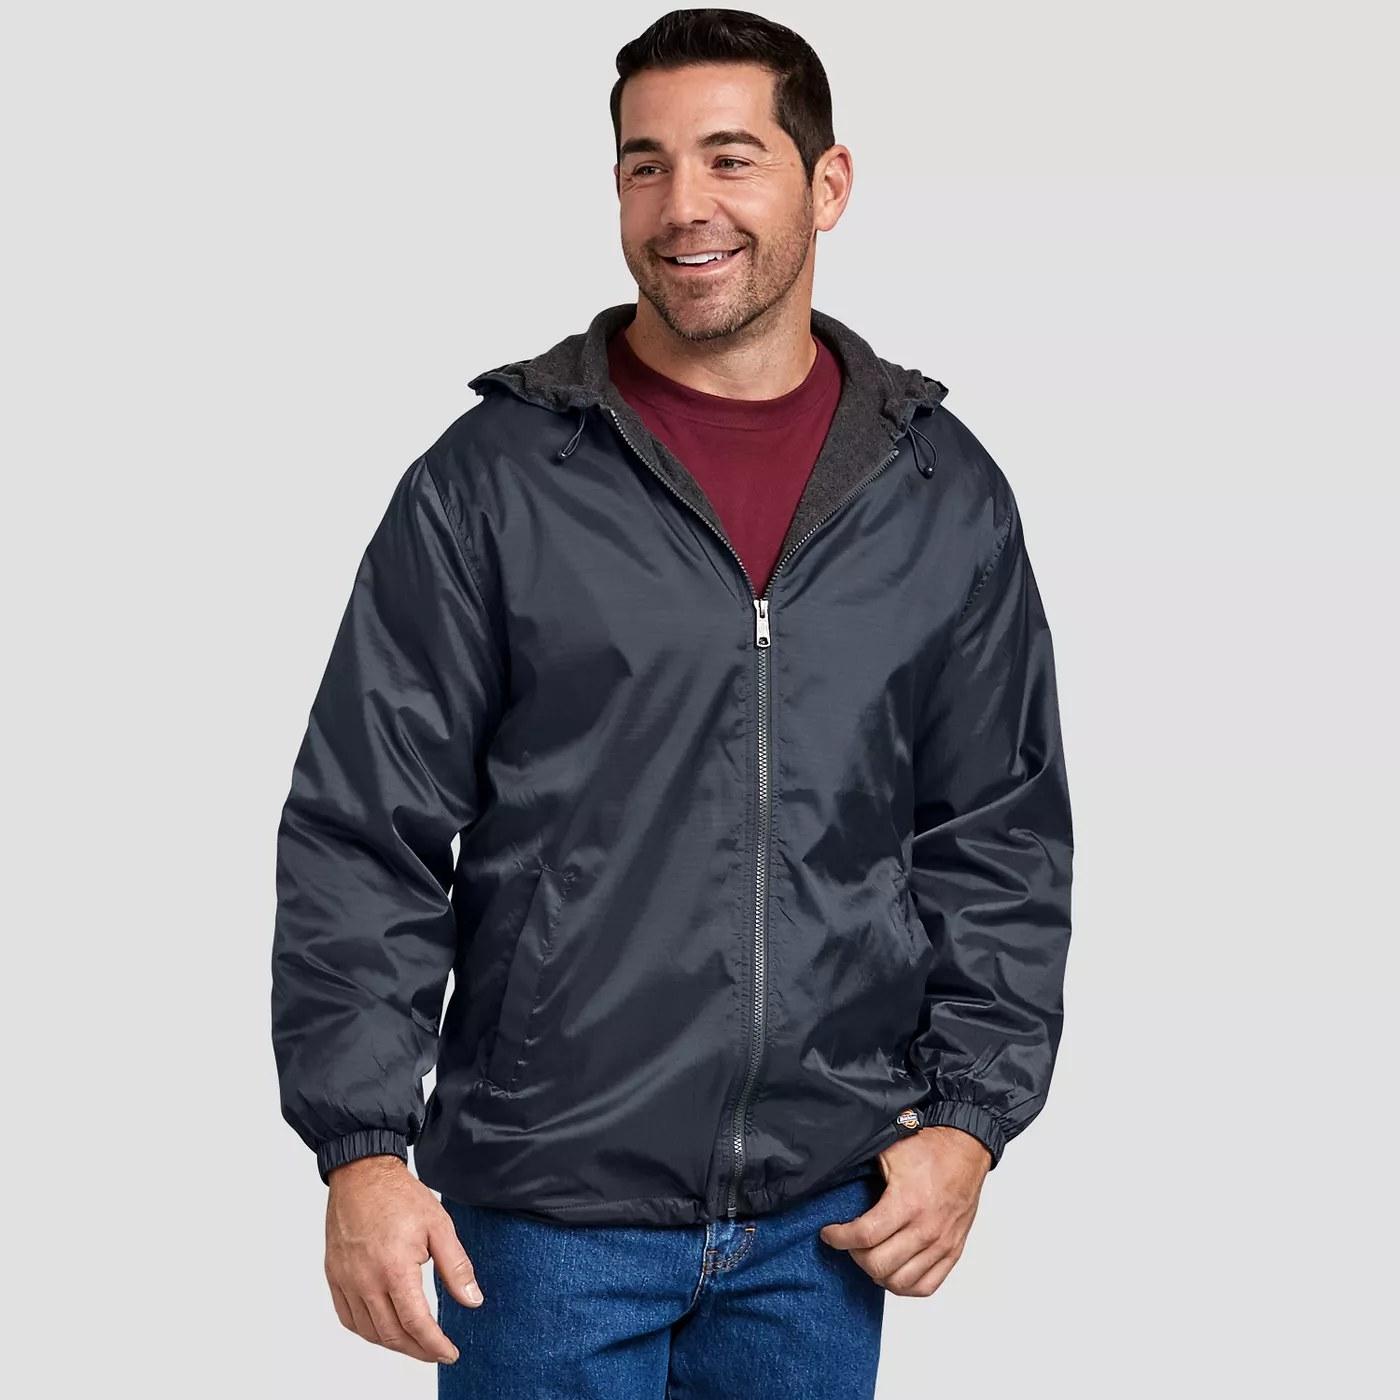 A dark blue rain jacket